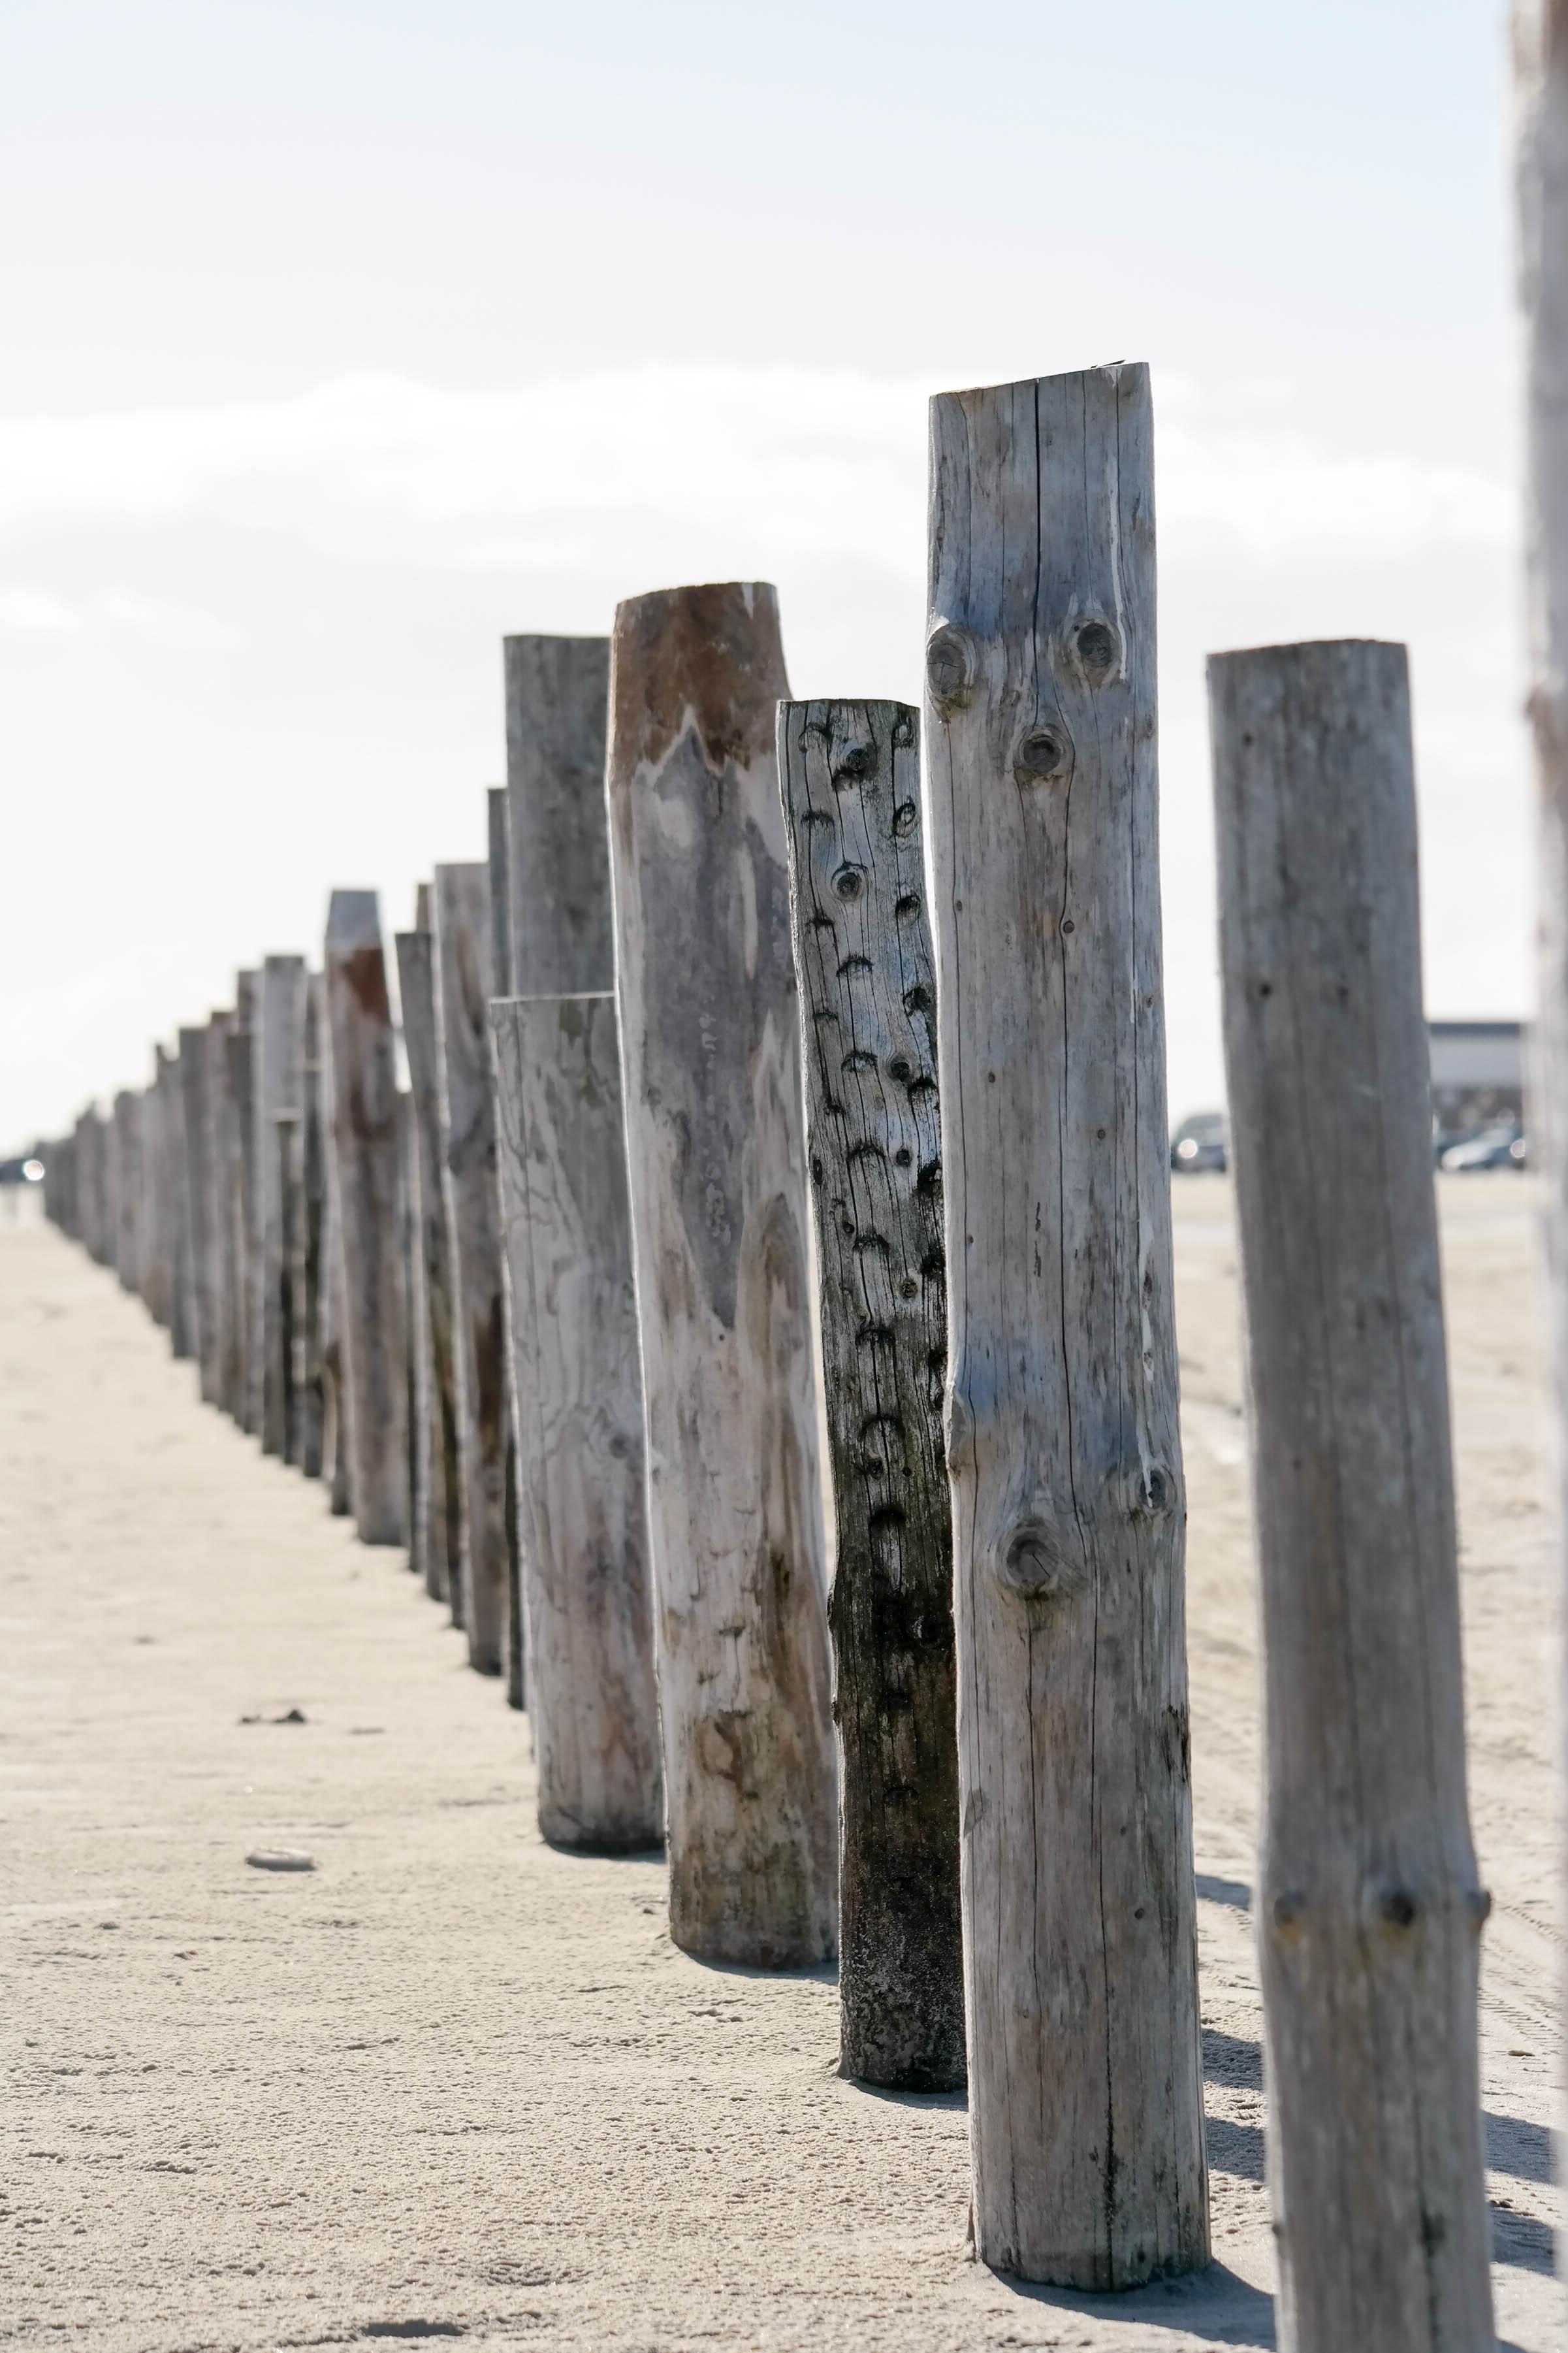 St. Peter-Ording Strand